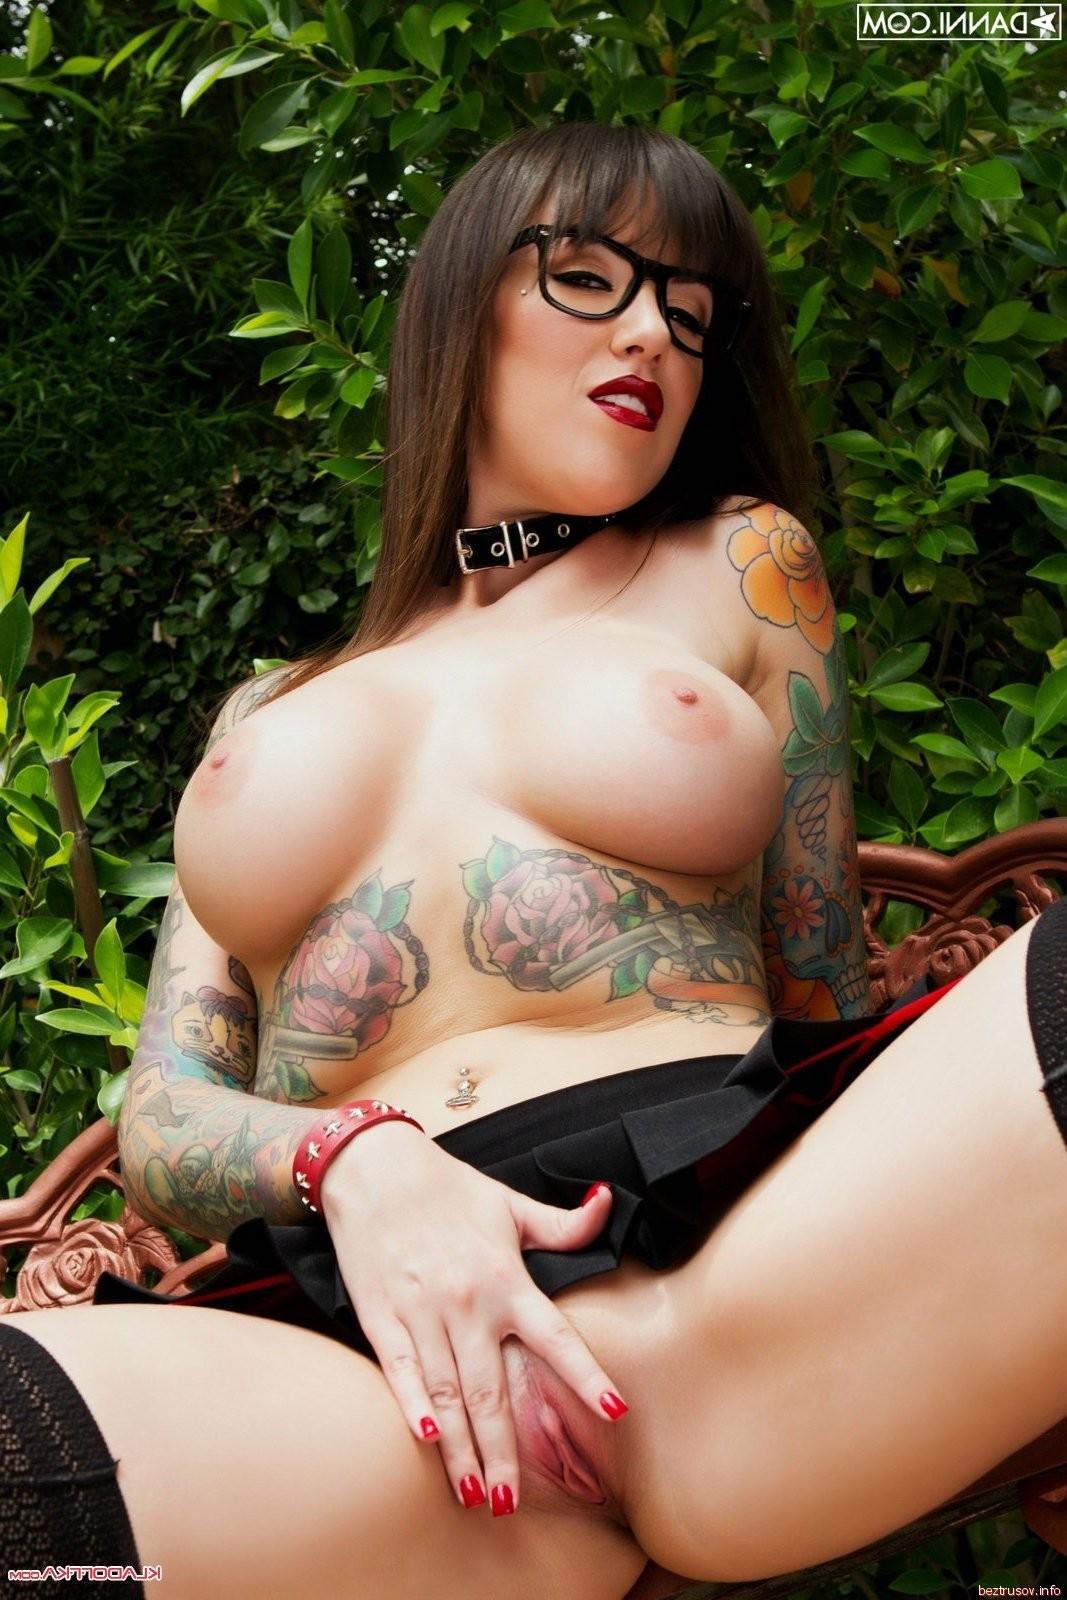 big dick nudes – BDSM